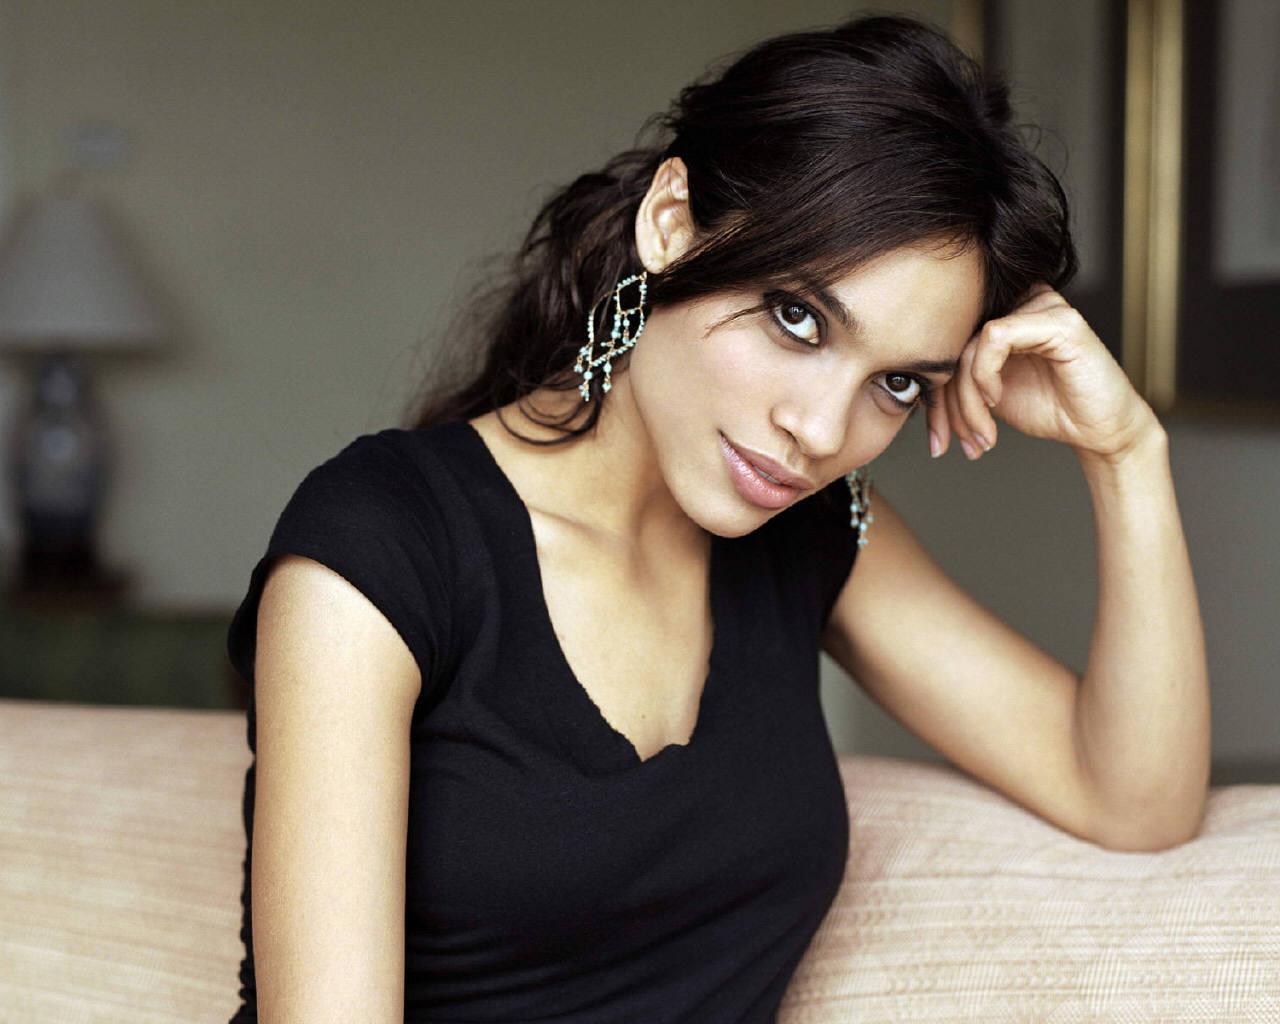 Rosario Dawson - Rosar... Rosario Dawson